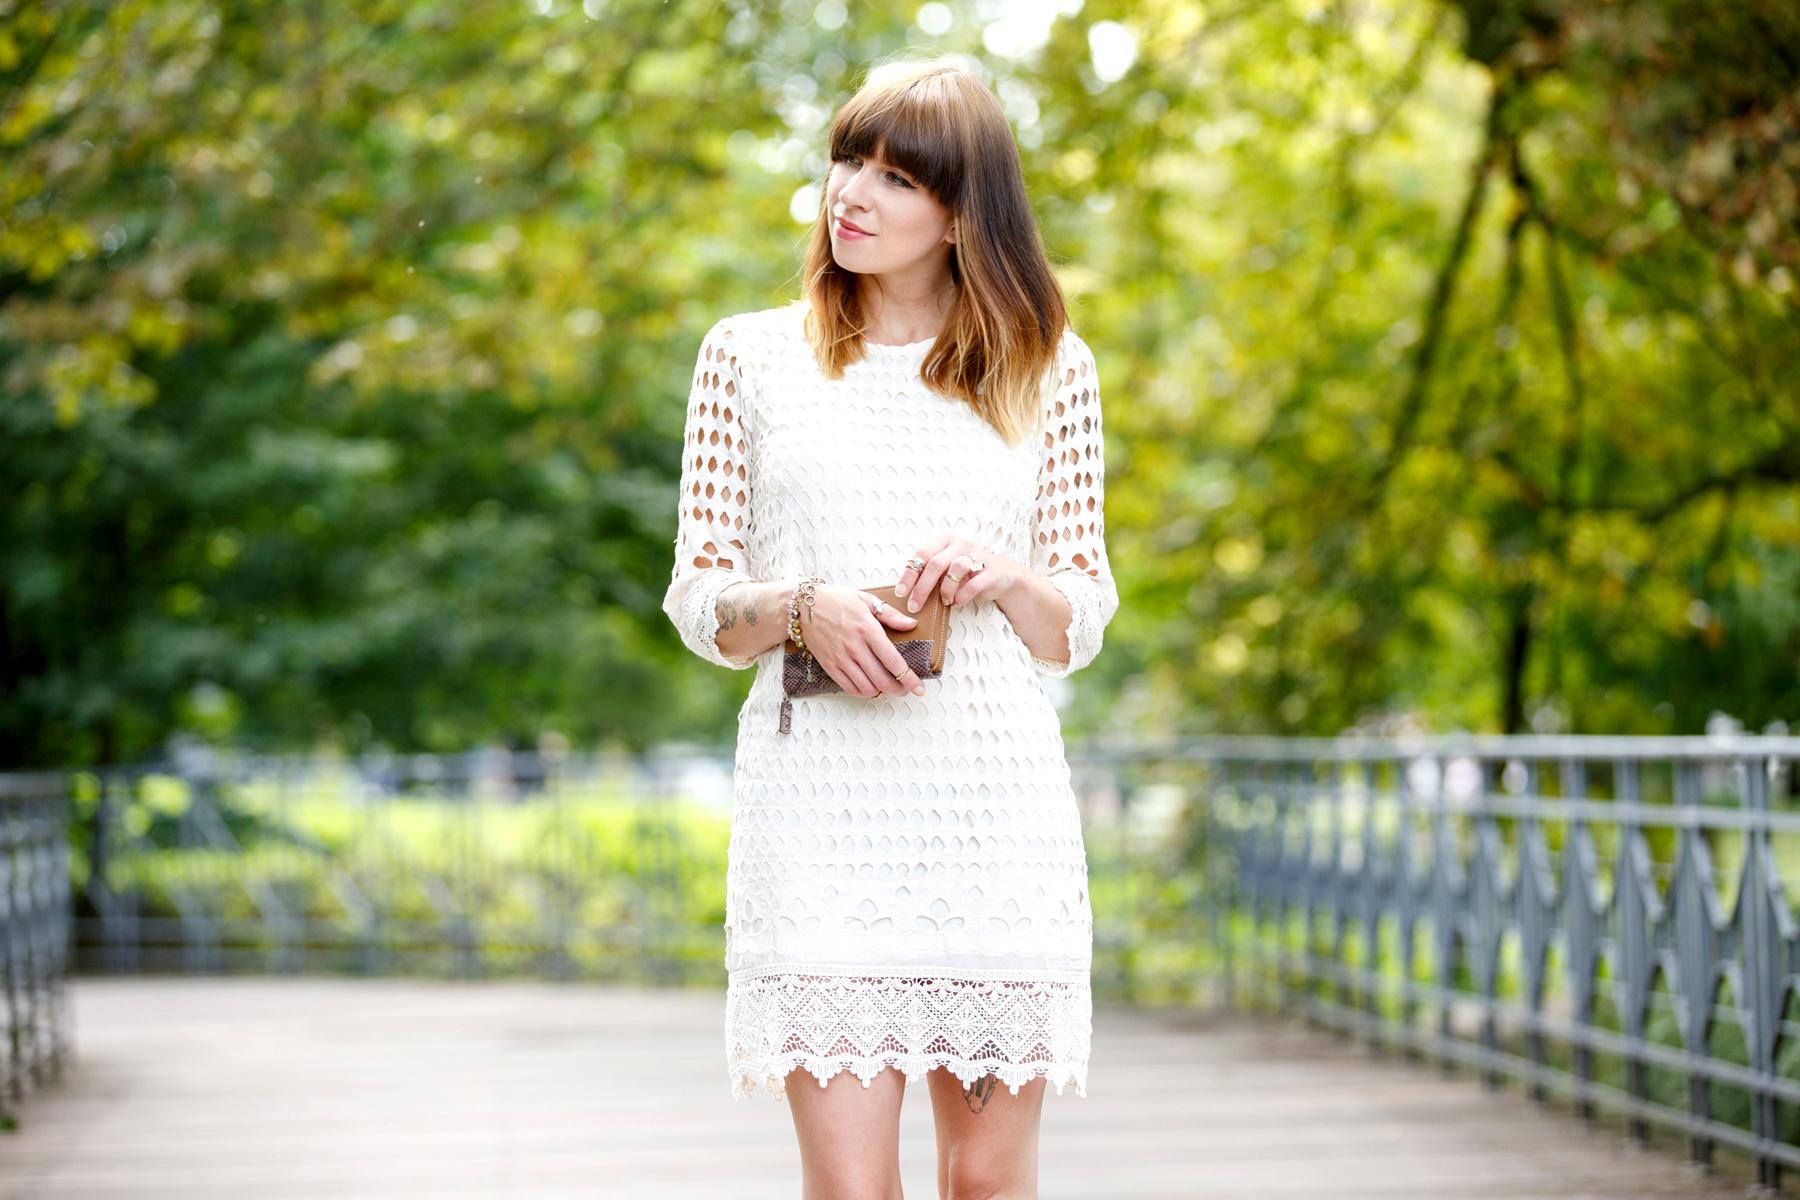 dress-for-less outfit styling white sommerkleid summer look crochet wrangler hilfiger fashion blog germany düsseldorf ricarda schernus cats & dogs 1